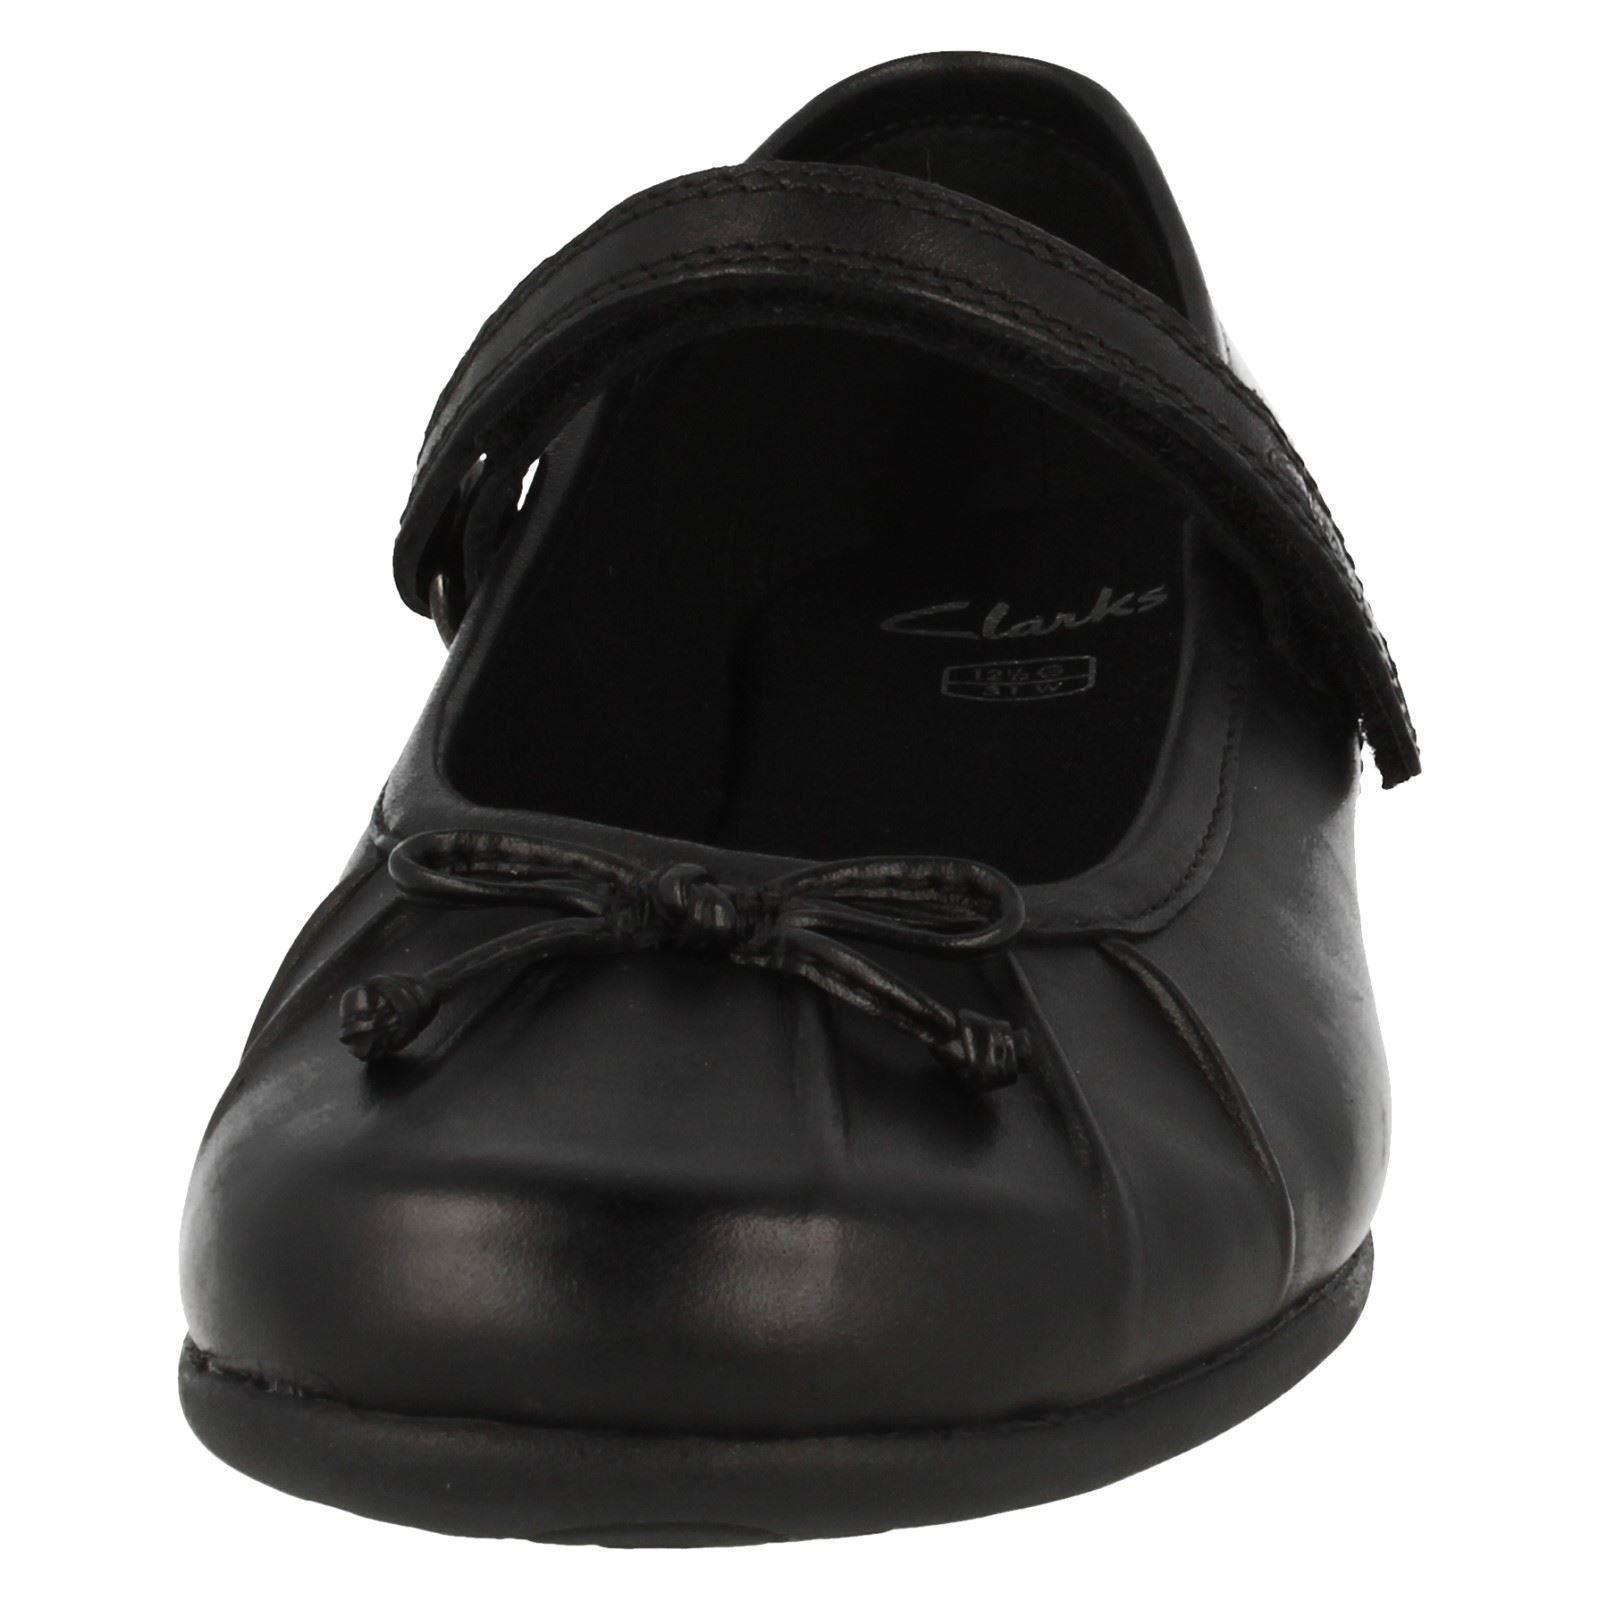 "Chicas Clarks Zapatos Escolares /""Tasha Ally/"""